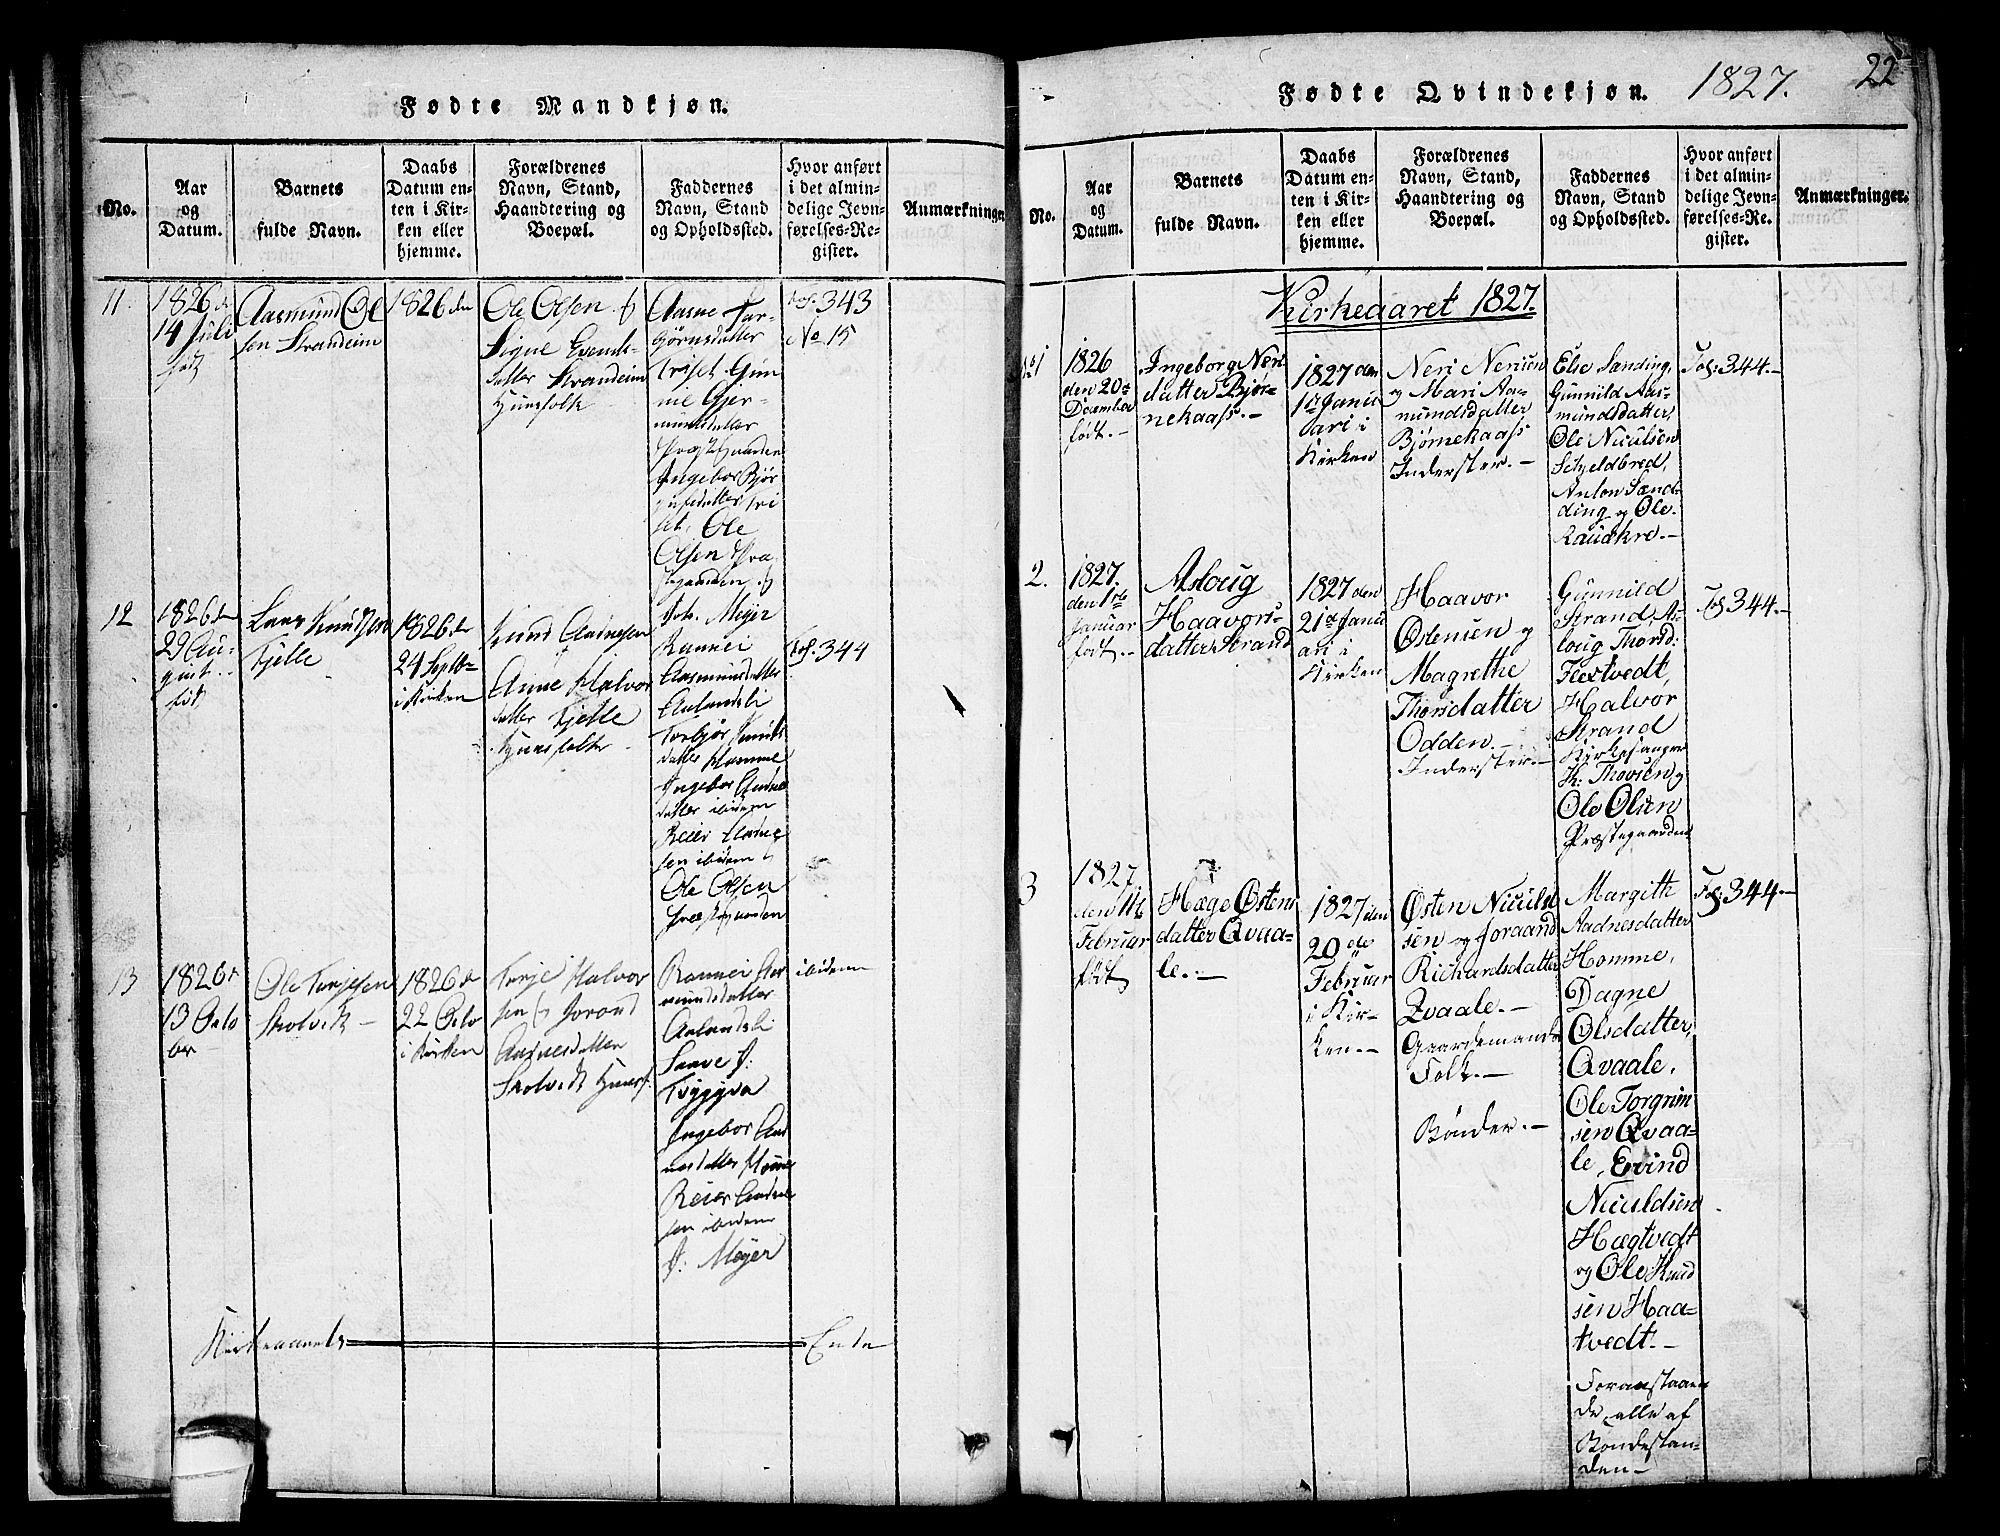 SAKO, Lårdal kirkebøker, G/Ga/L0001: Klokkerbok nr. I 1, 1815-1861, s. 22